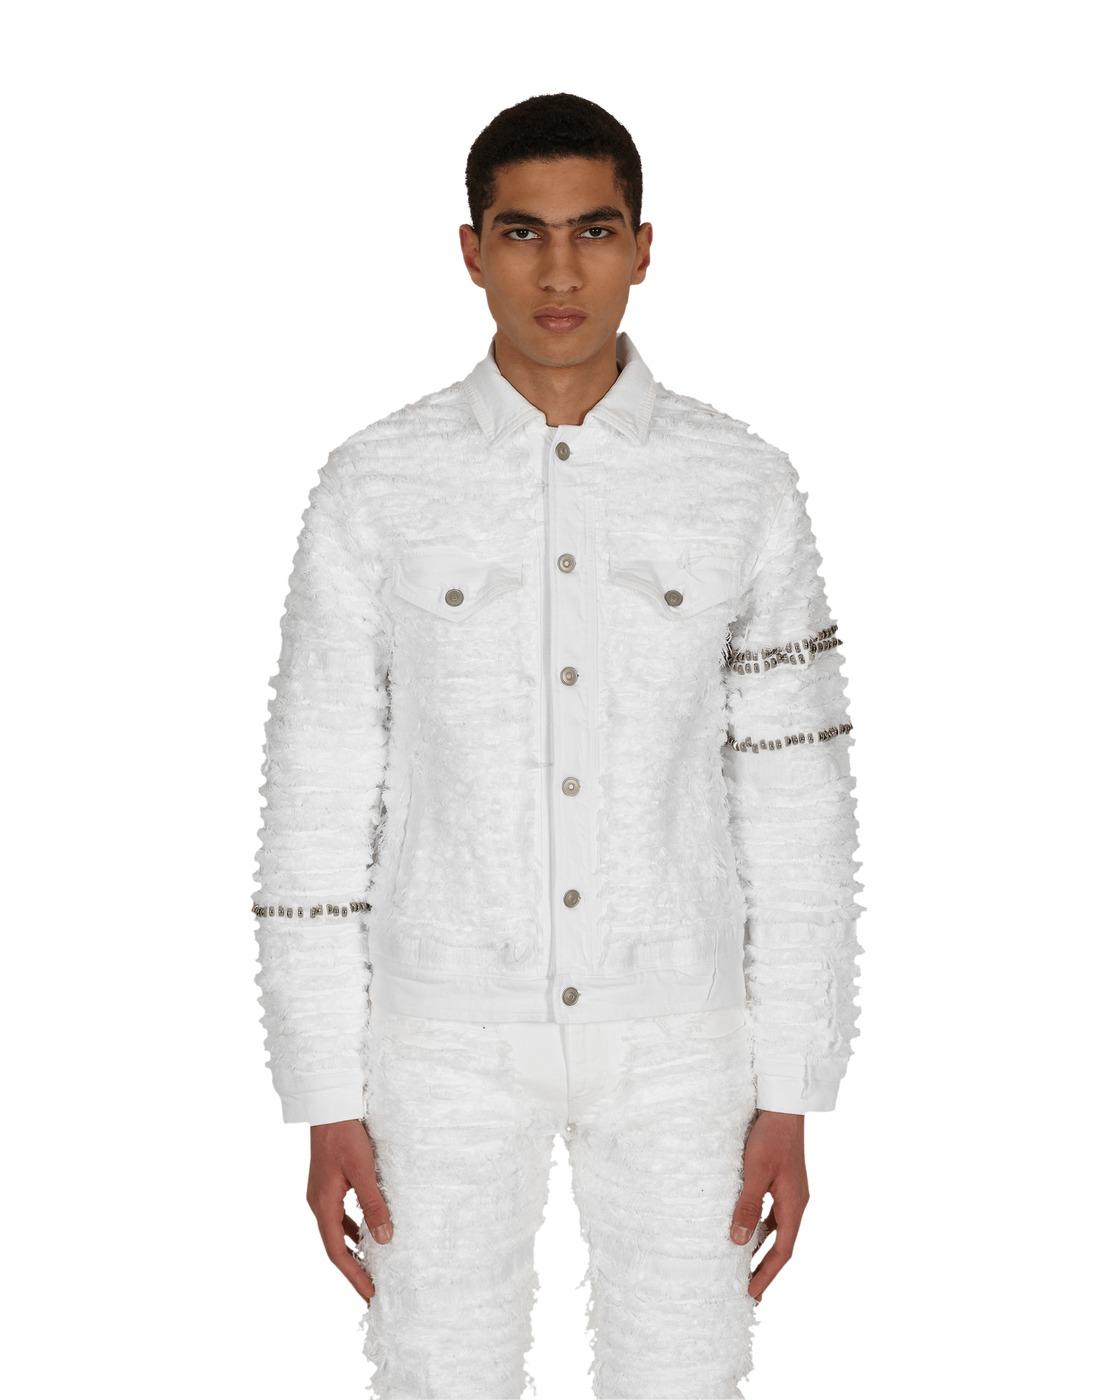 Photo: 1017 Alyx 9sm Blackmeans Studded Denim Jacket White